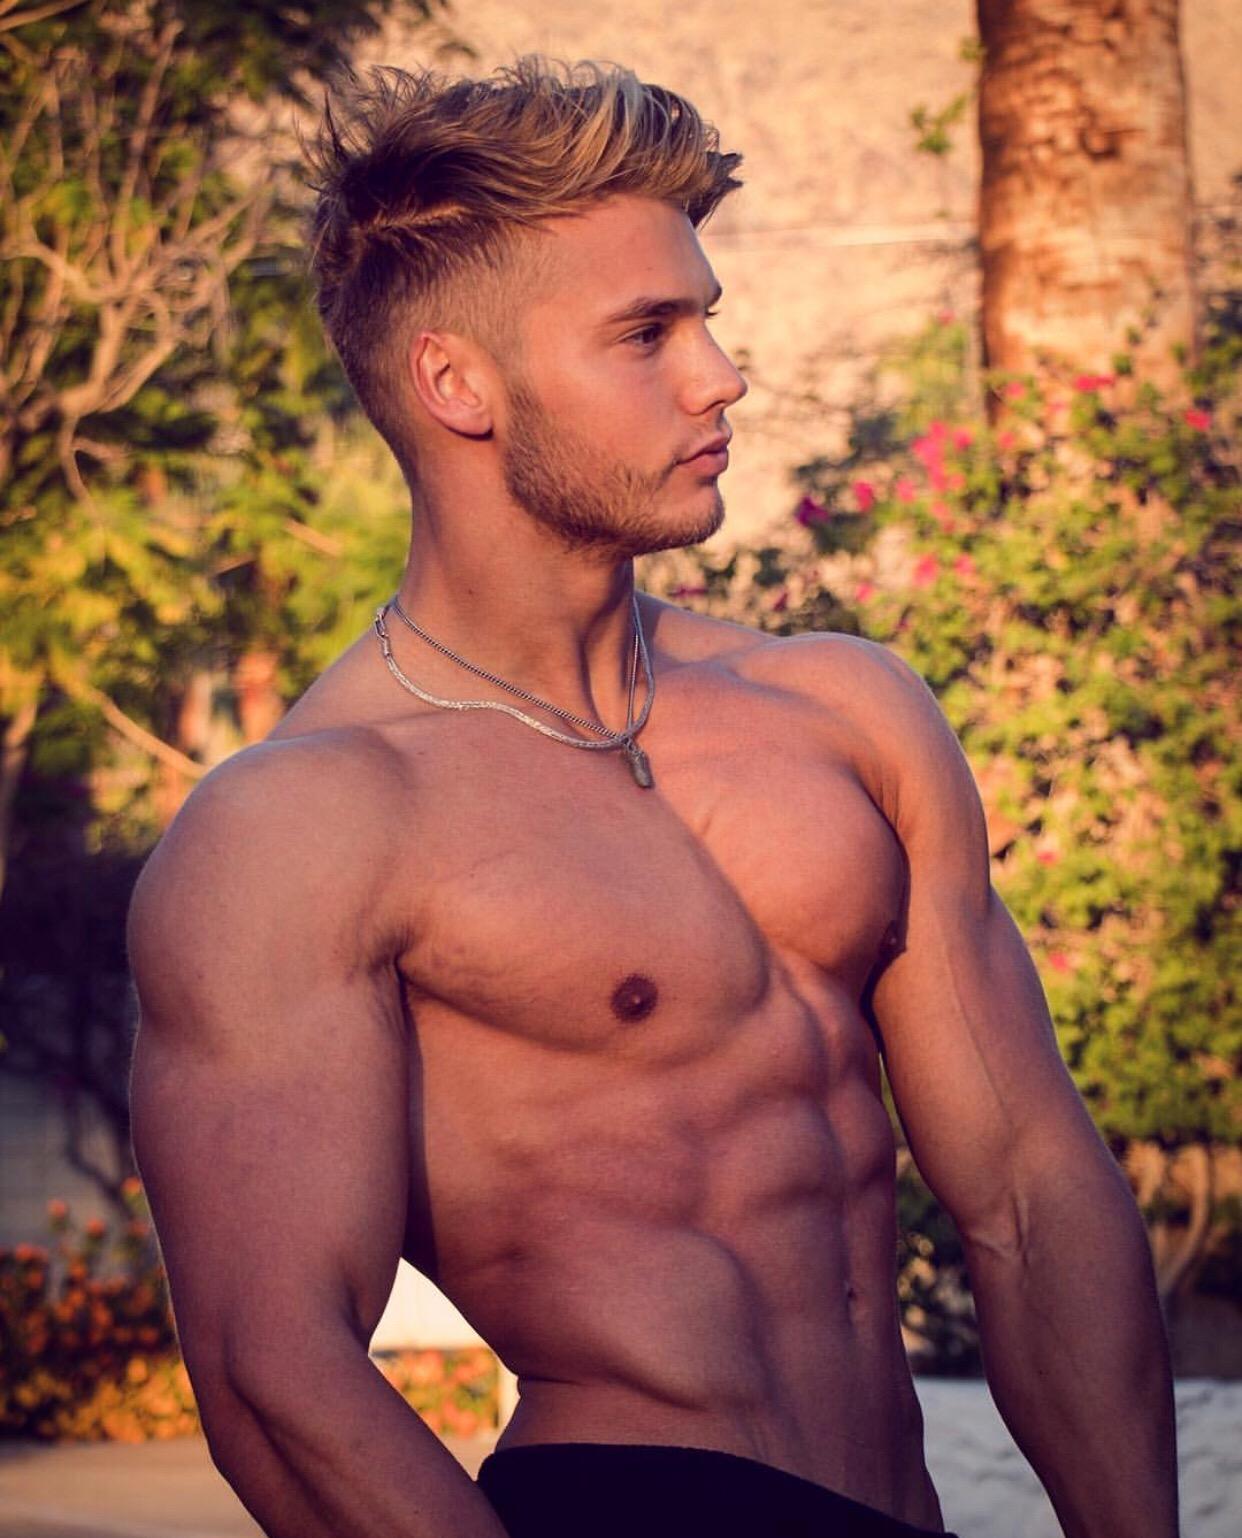 Young Nude Gymnastics Guys Gay Cooper Fills